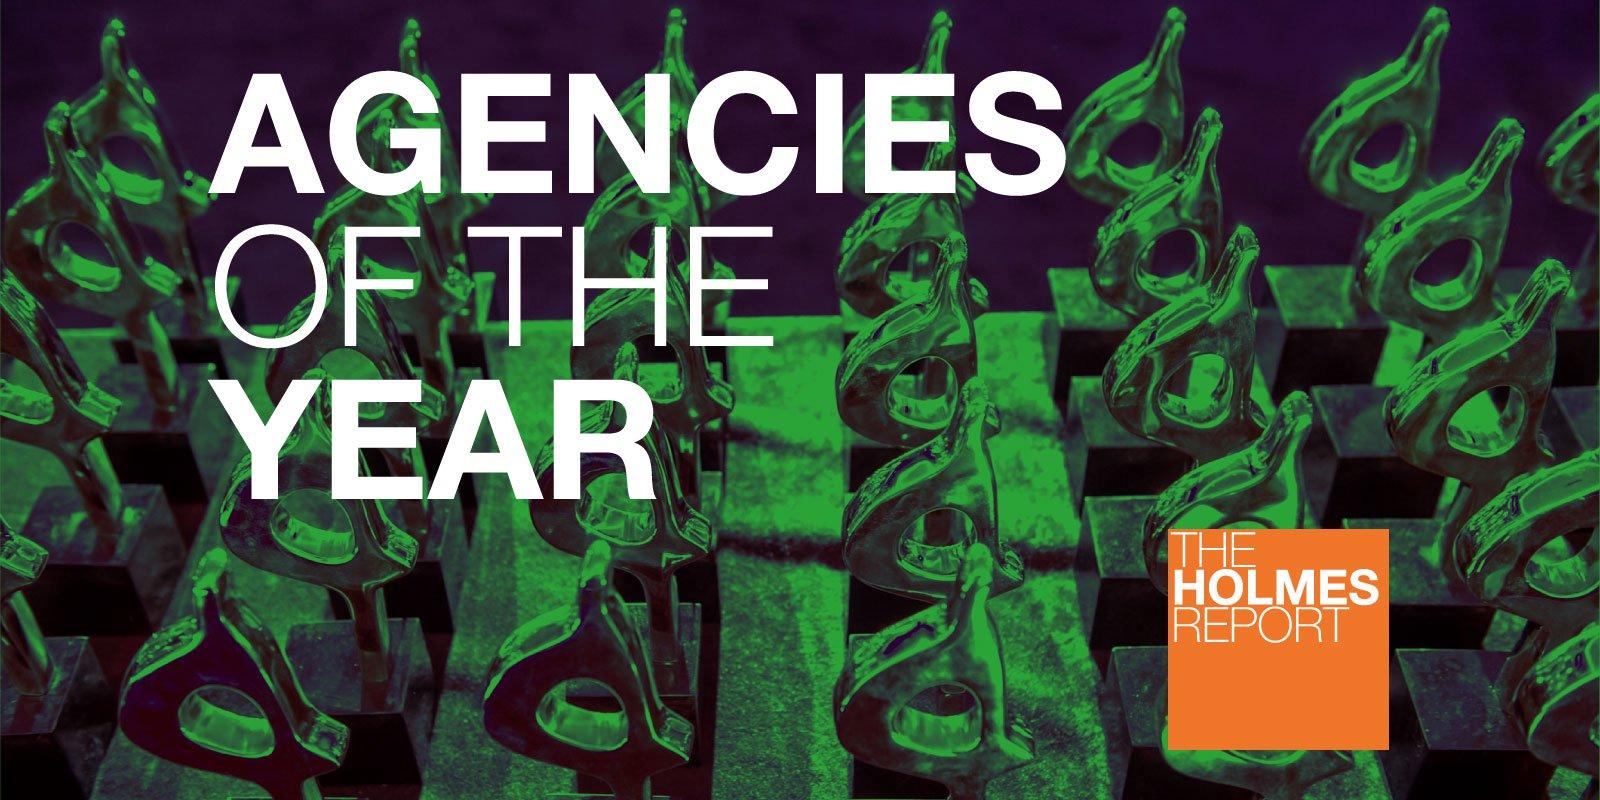 agencies-of-the-year-banner-social.jpg